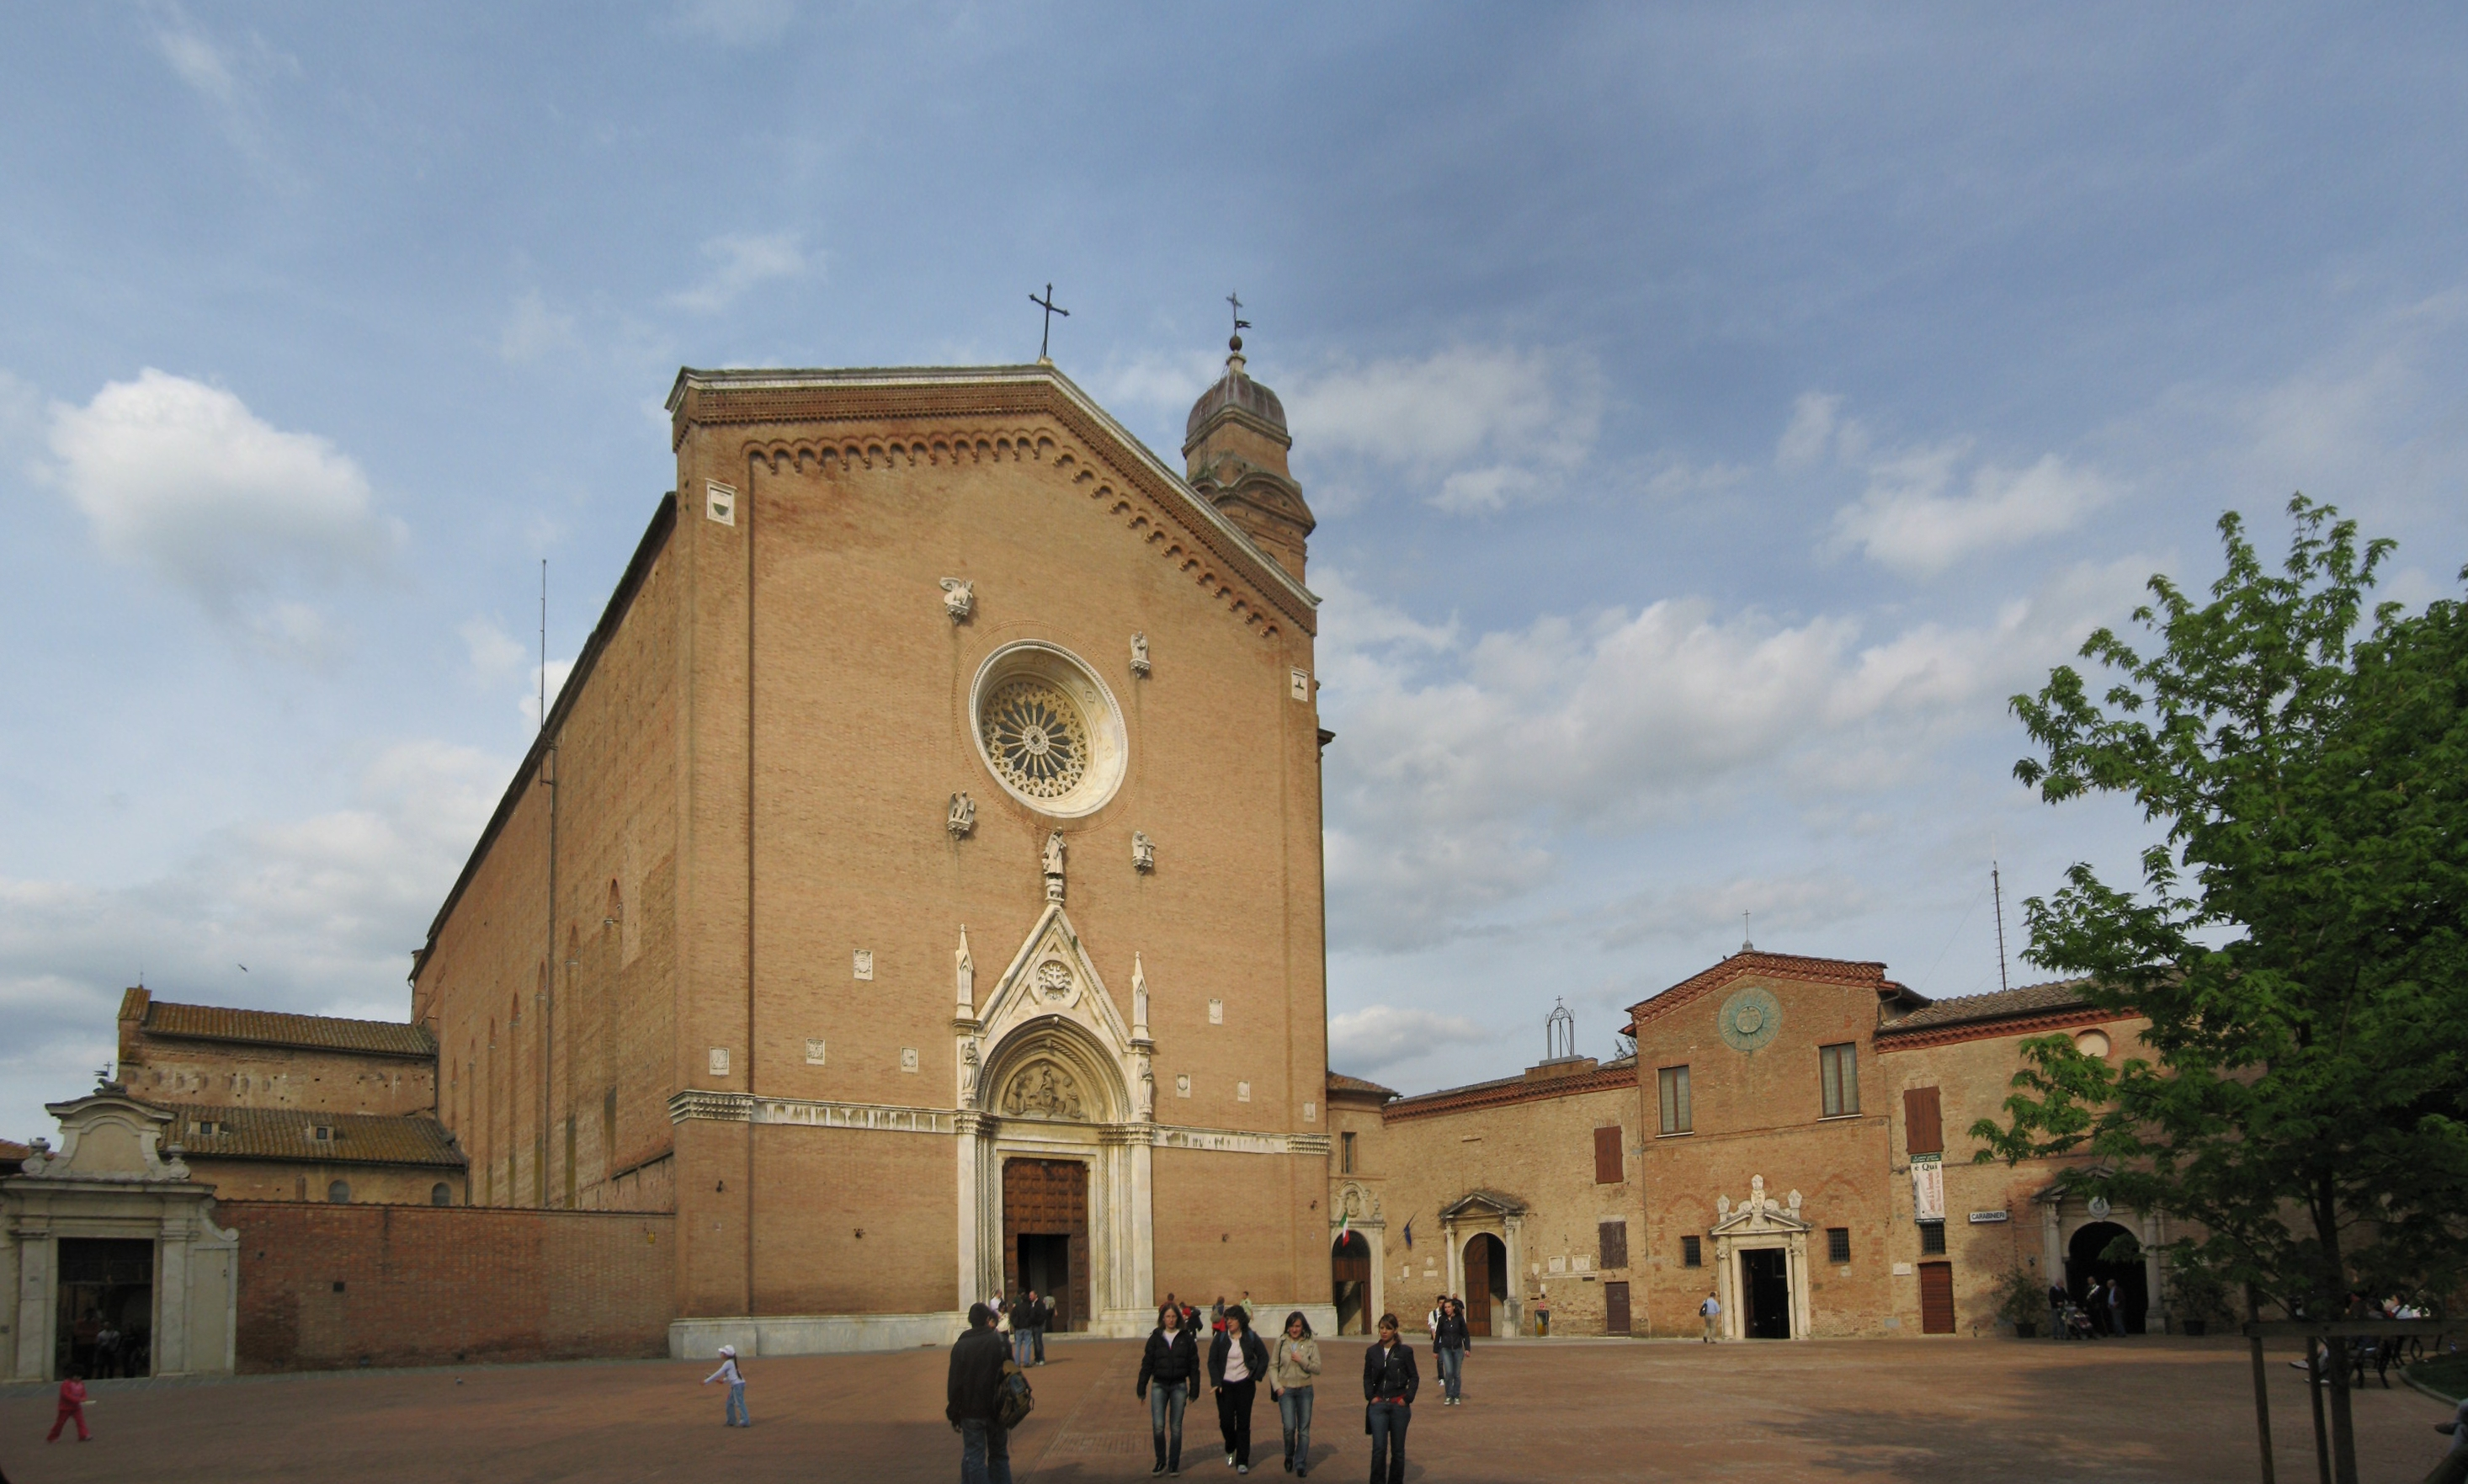 Basilica of San Francesco, Siena - Wikipedia